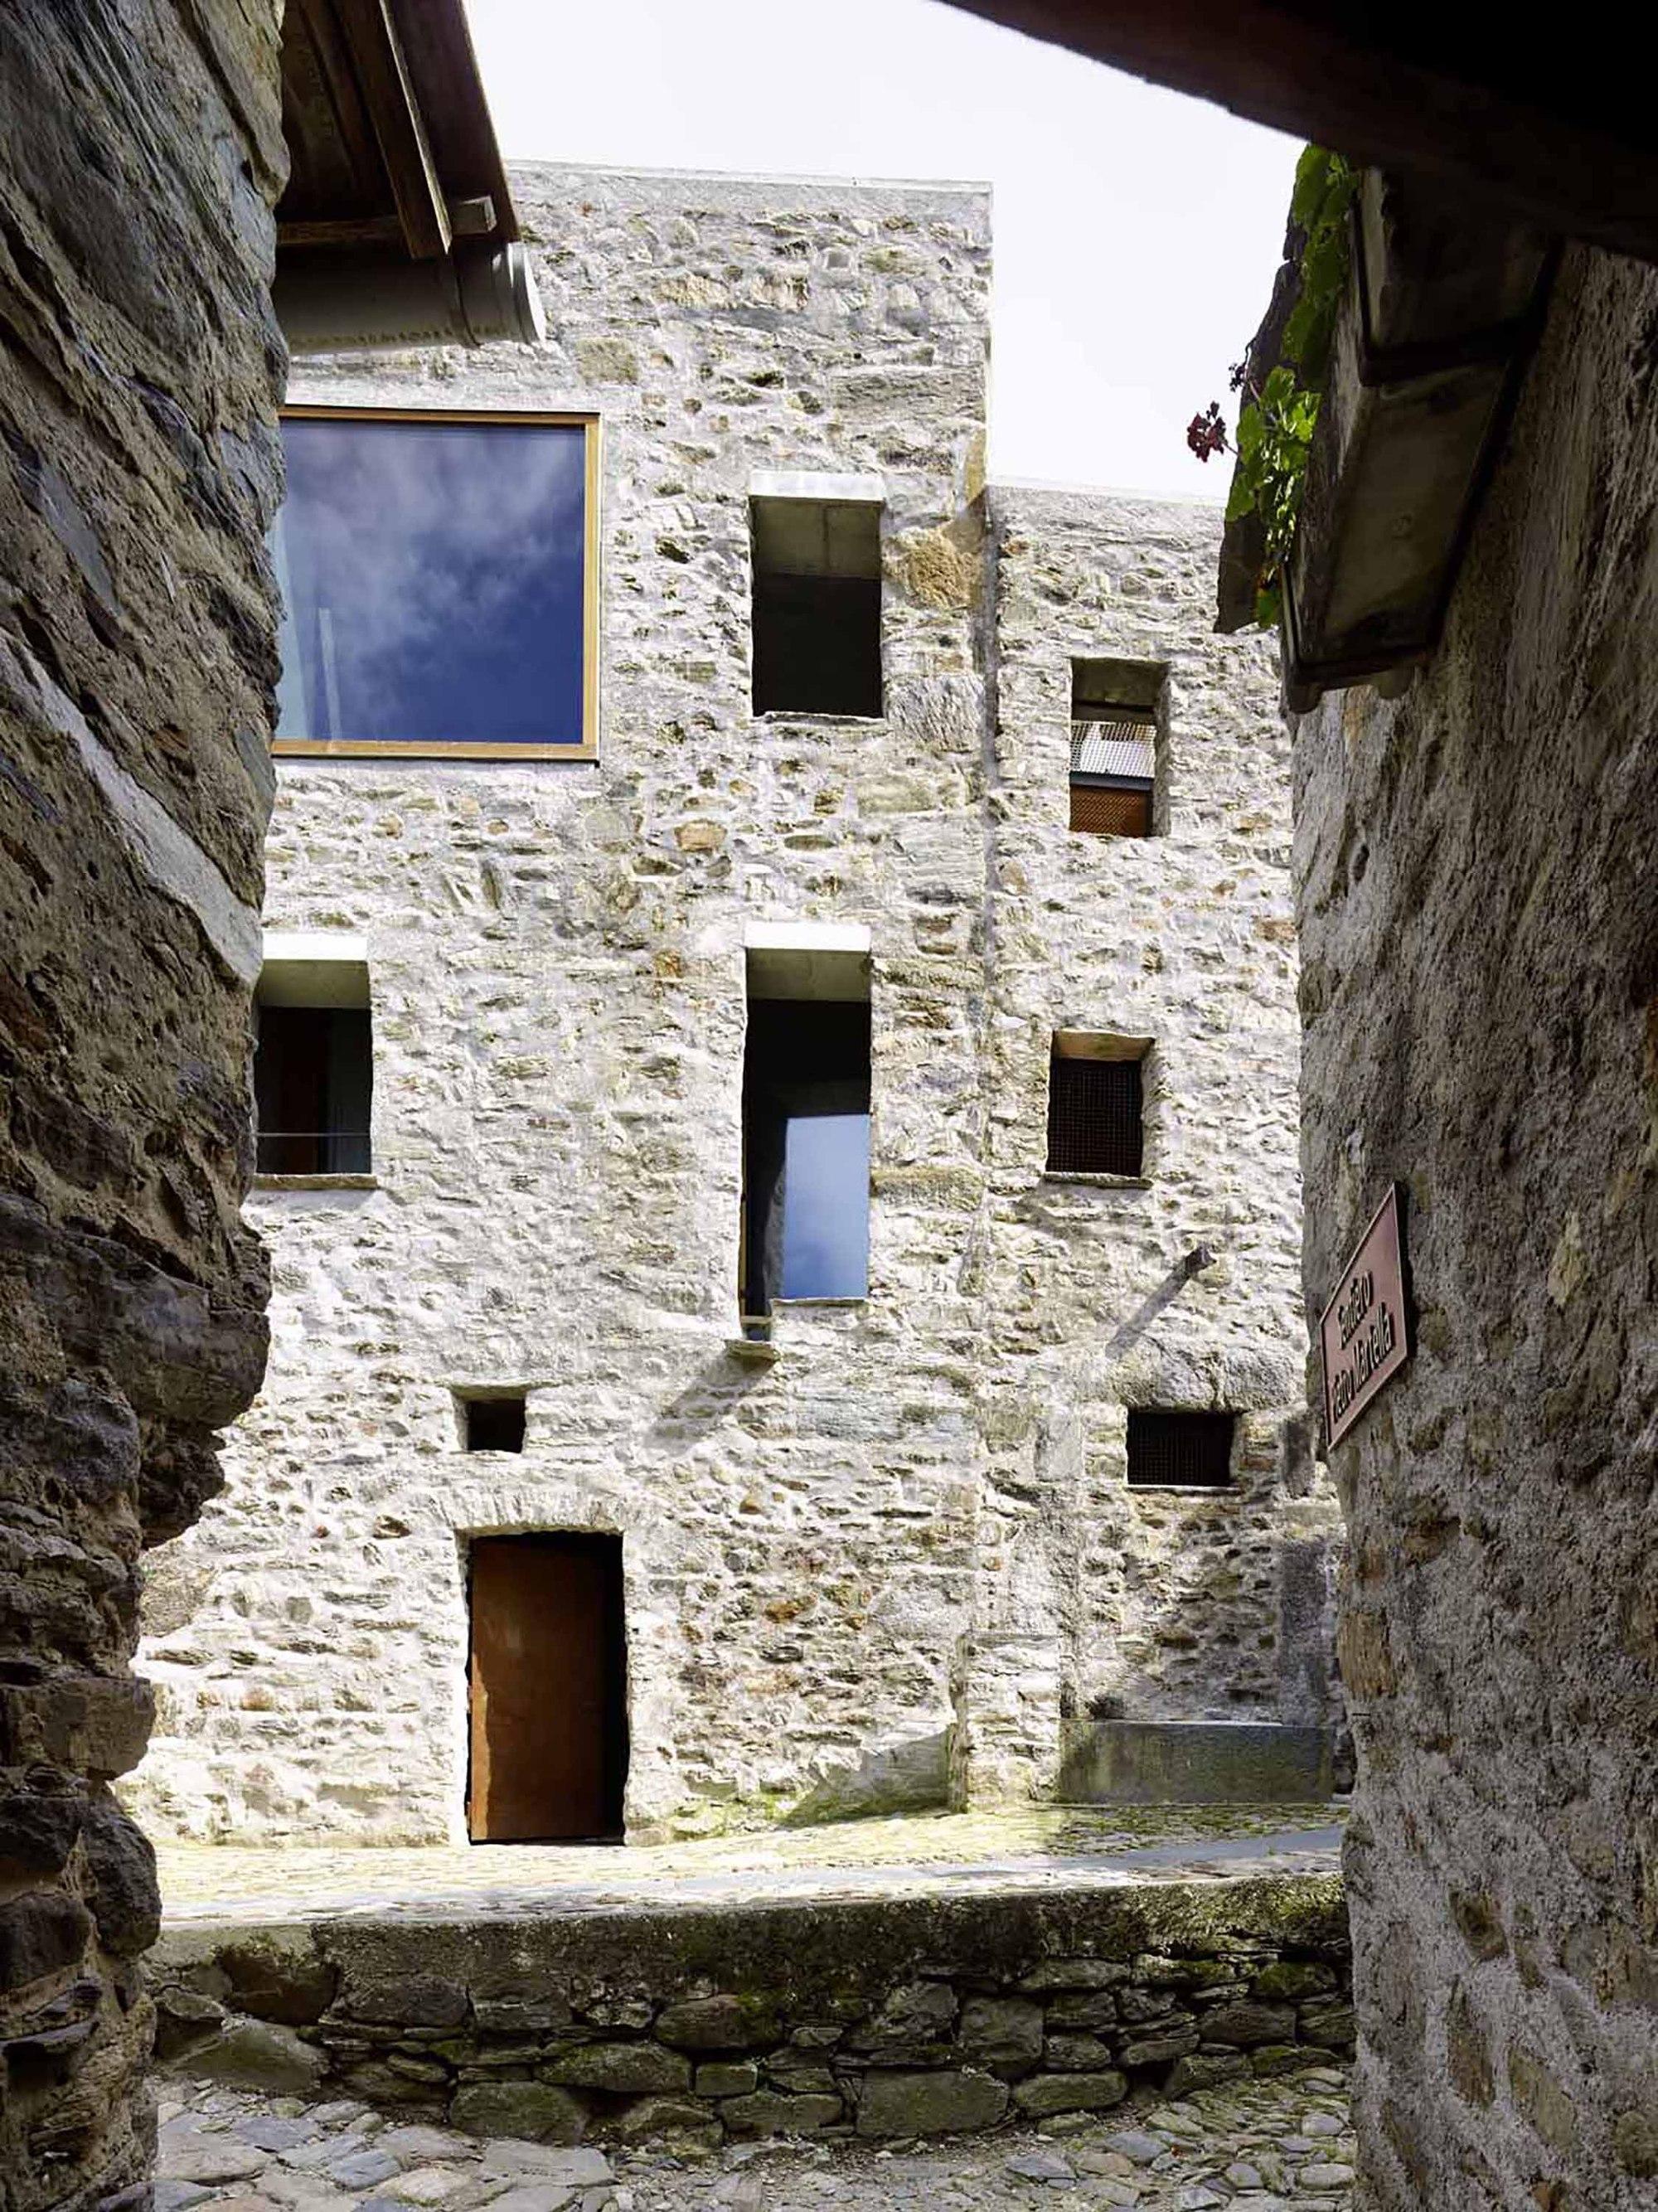 543dd67ec07a802a6900025d_stone-house-transformation-in-scaiano-wespi-de-meuron-romeo-architects_1430_cf031704.jpg